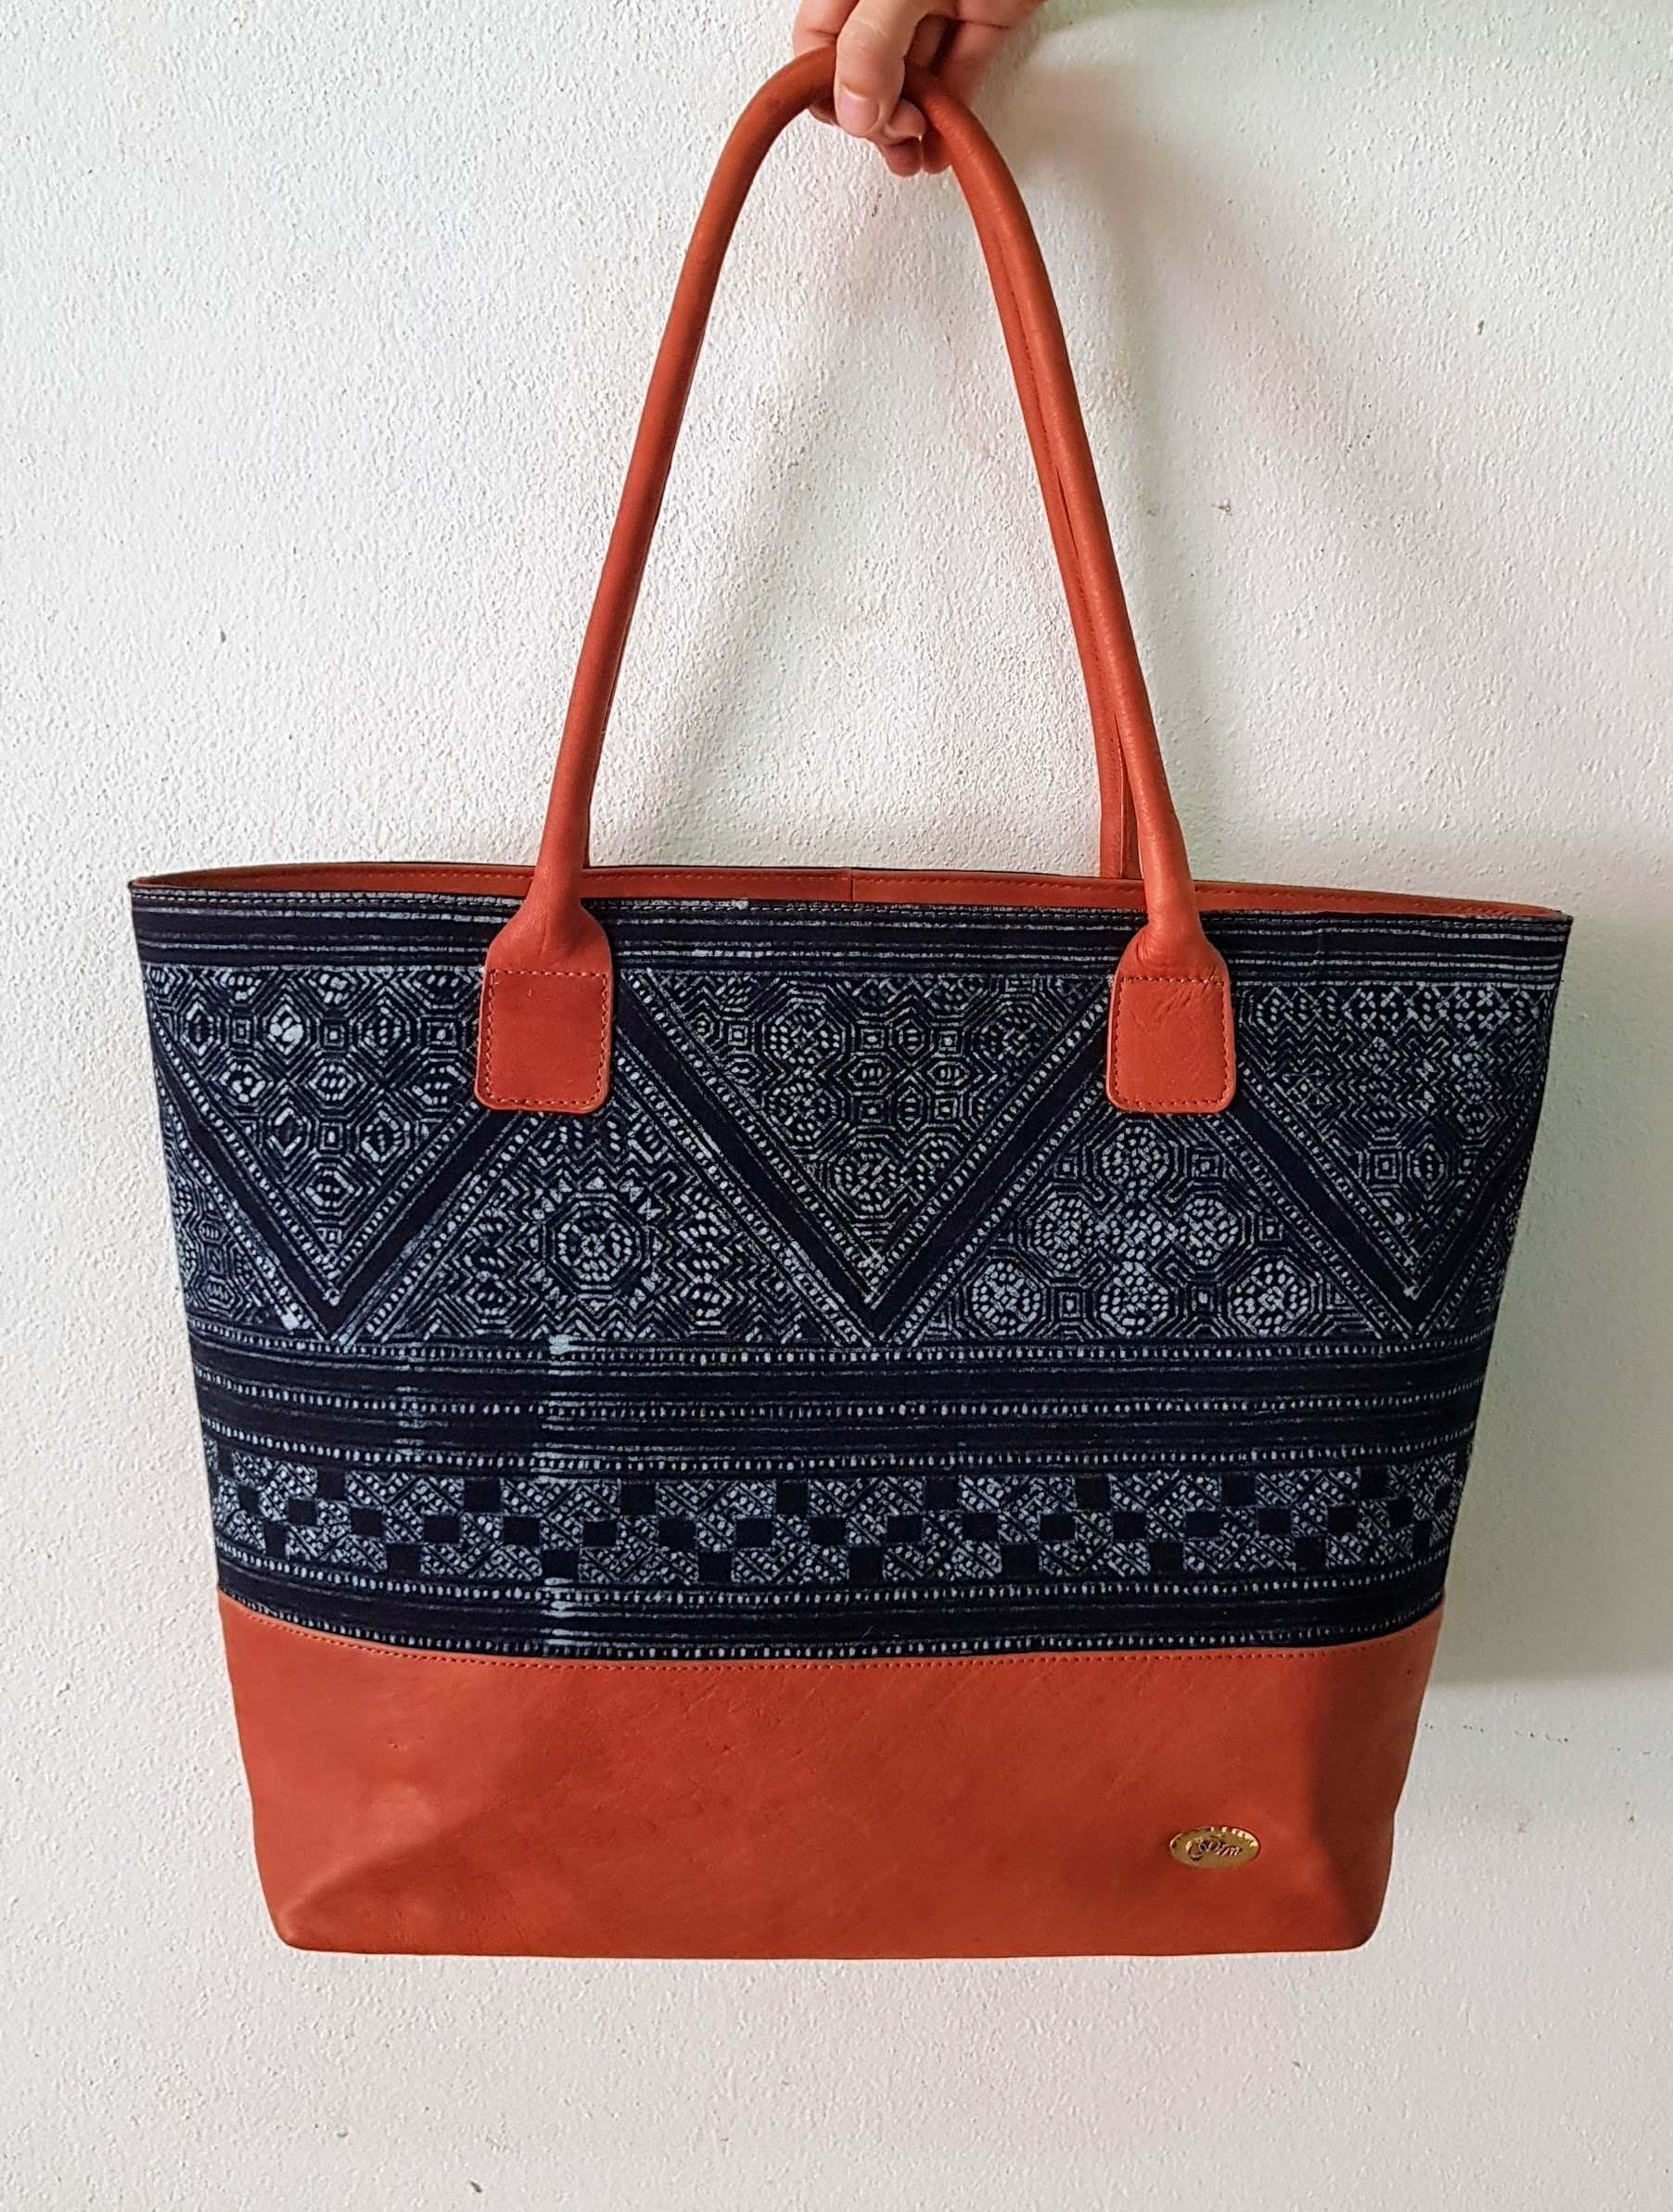 Bohemian / Diaper Bags / Handbags / Purses / Tote Bags / Annivesary Gifts / Christmas Gift Ideas / Indigo Blue